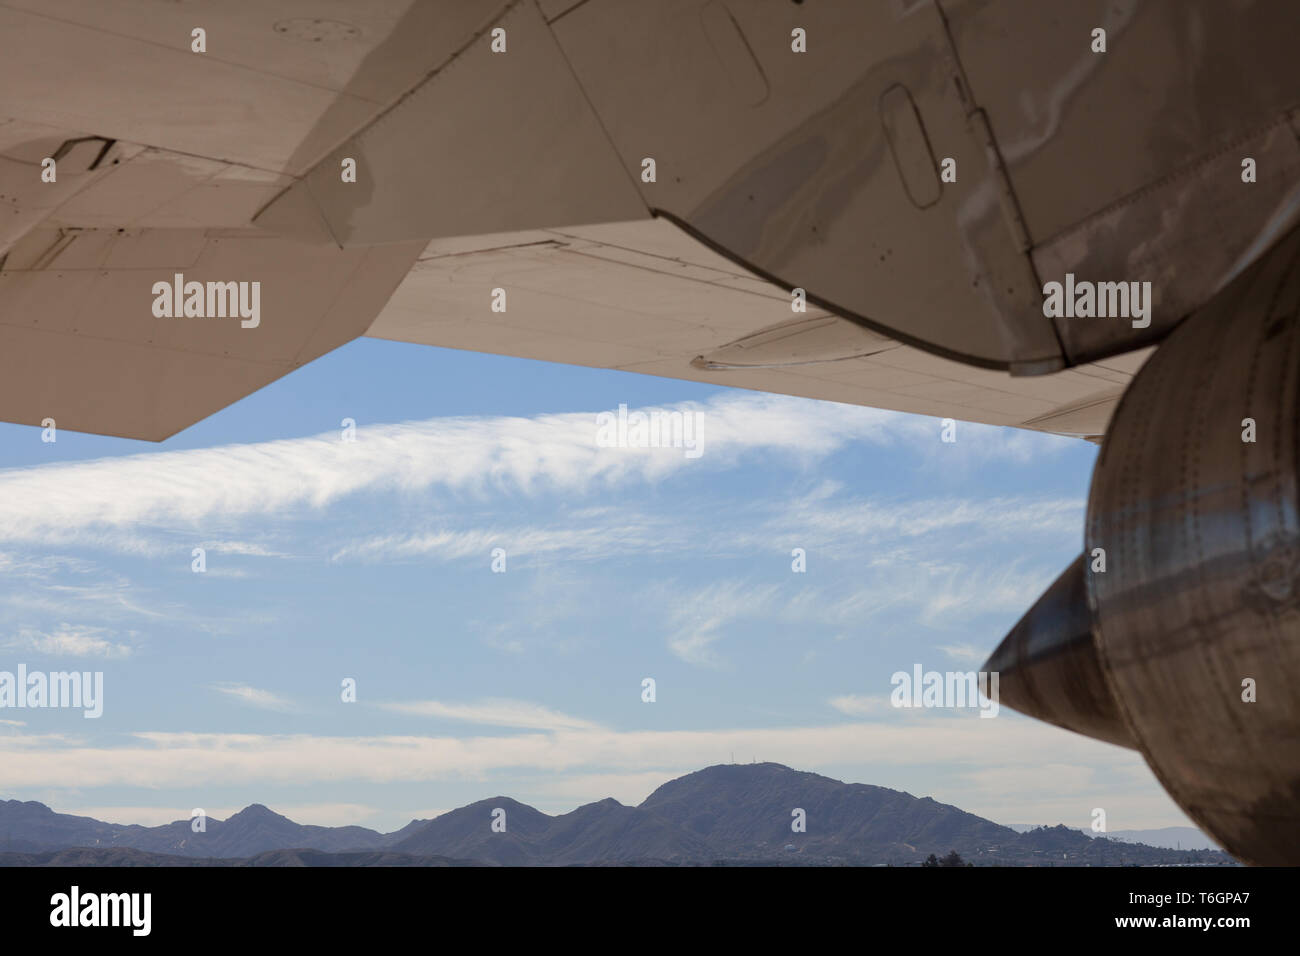 Spectacular view of an aircraft, closeup.Blue sky, mountains, day time. - Stock Image